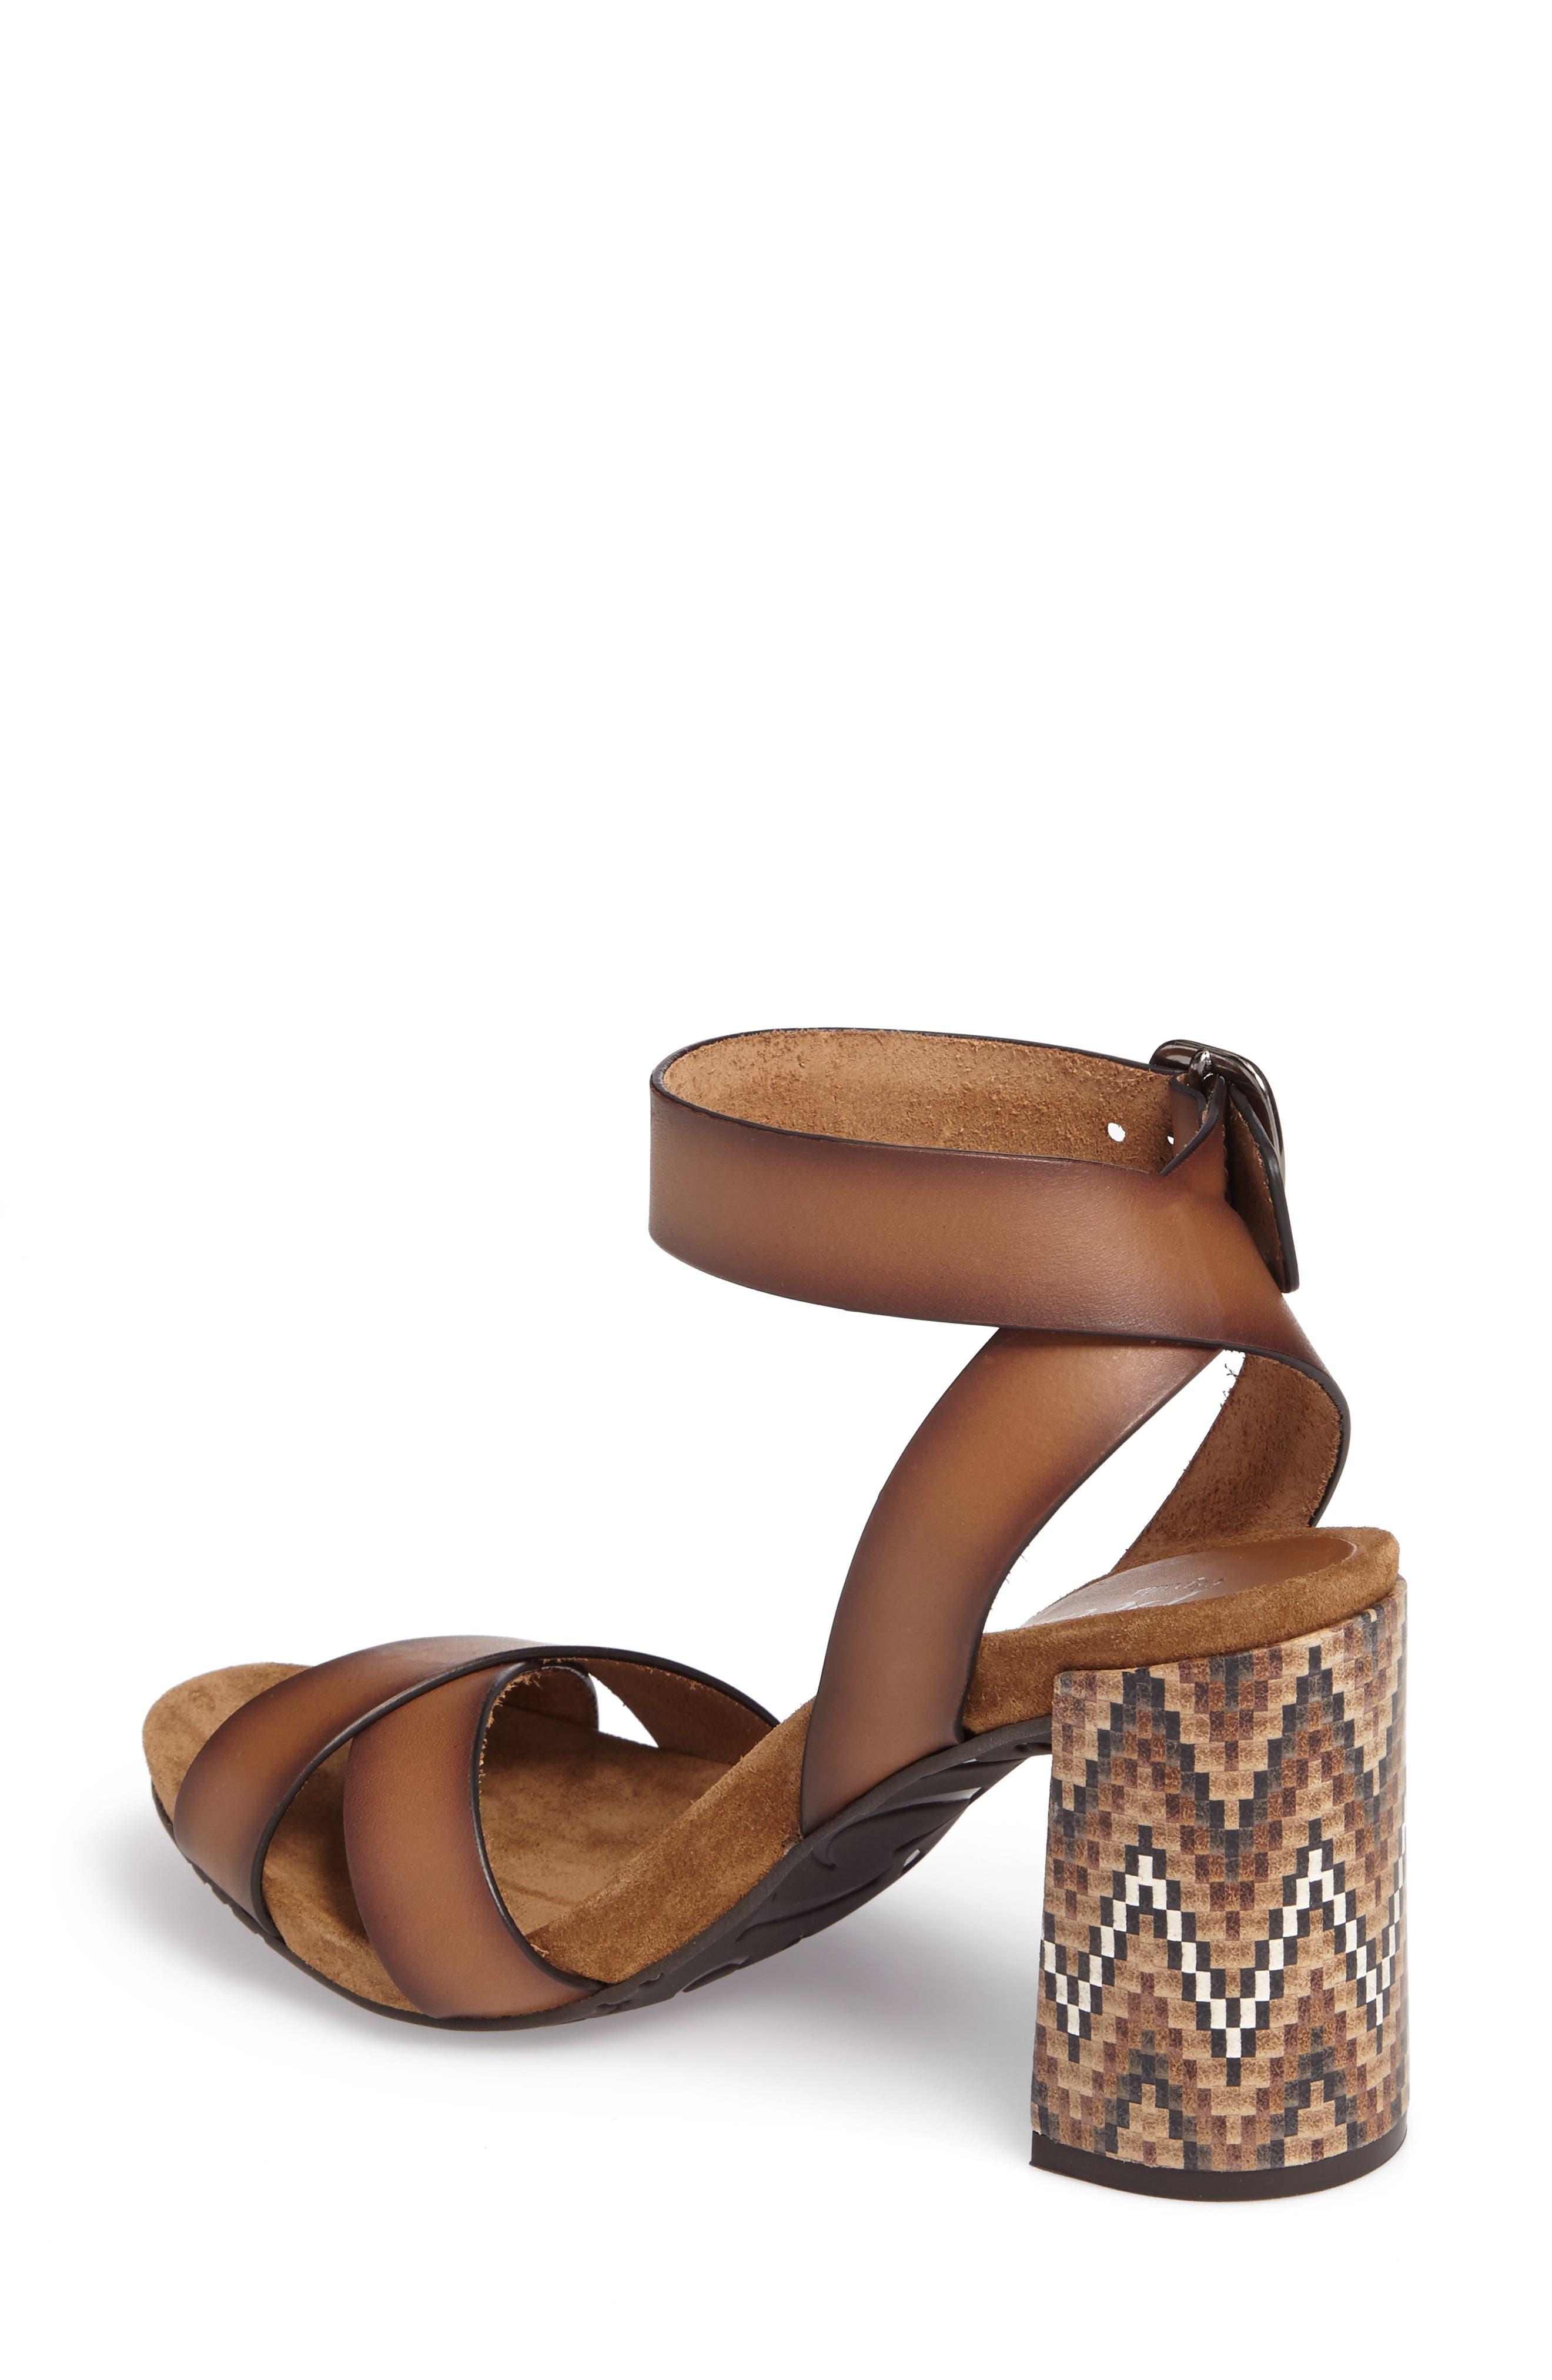 Yemba Embellished Heel Sandal,                             Alternate thumbnail 2, color,                             Cigar Vacchetta